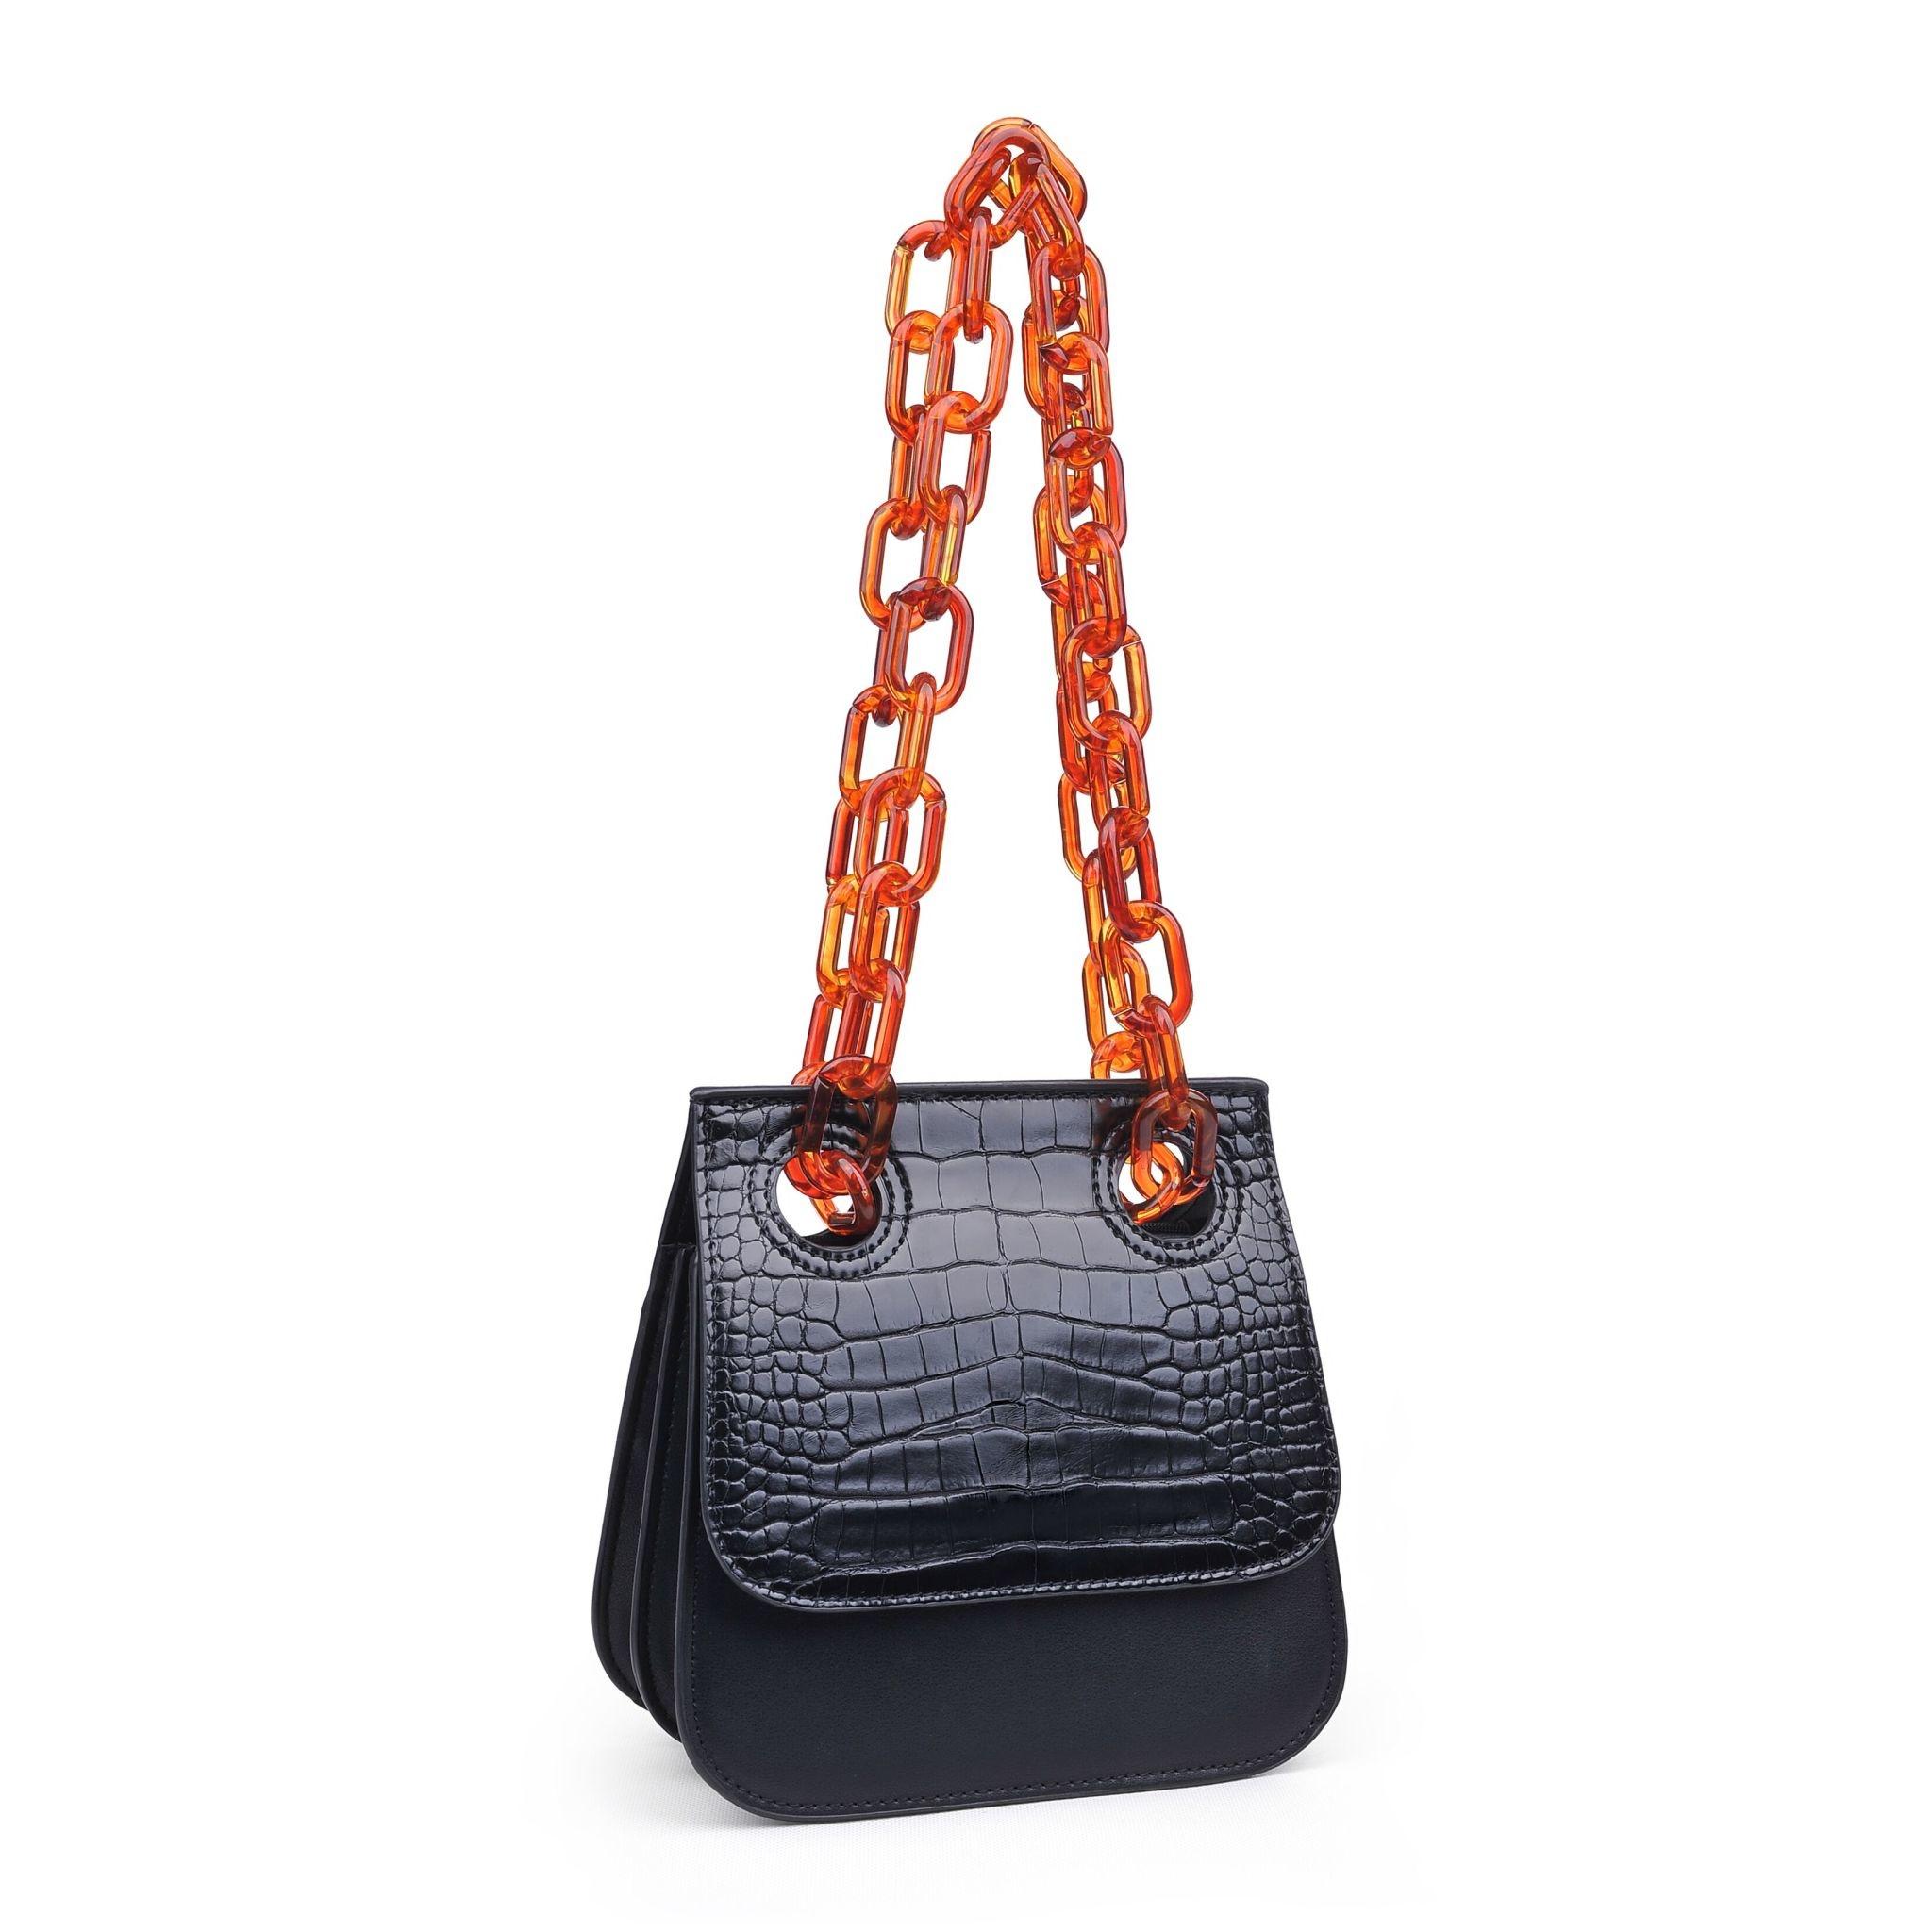 Urban Whitney Handbag